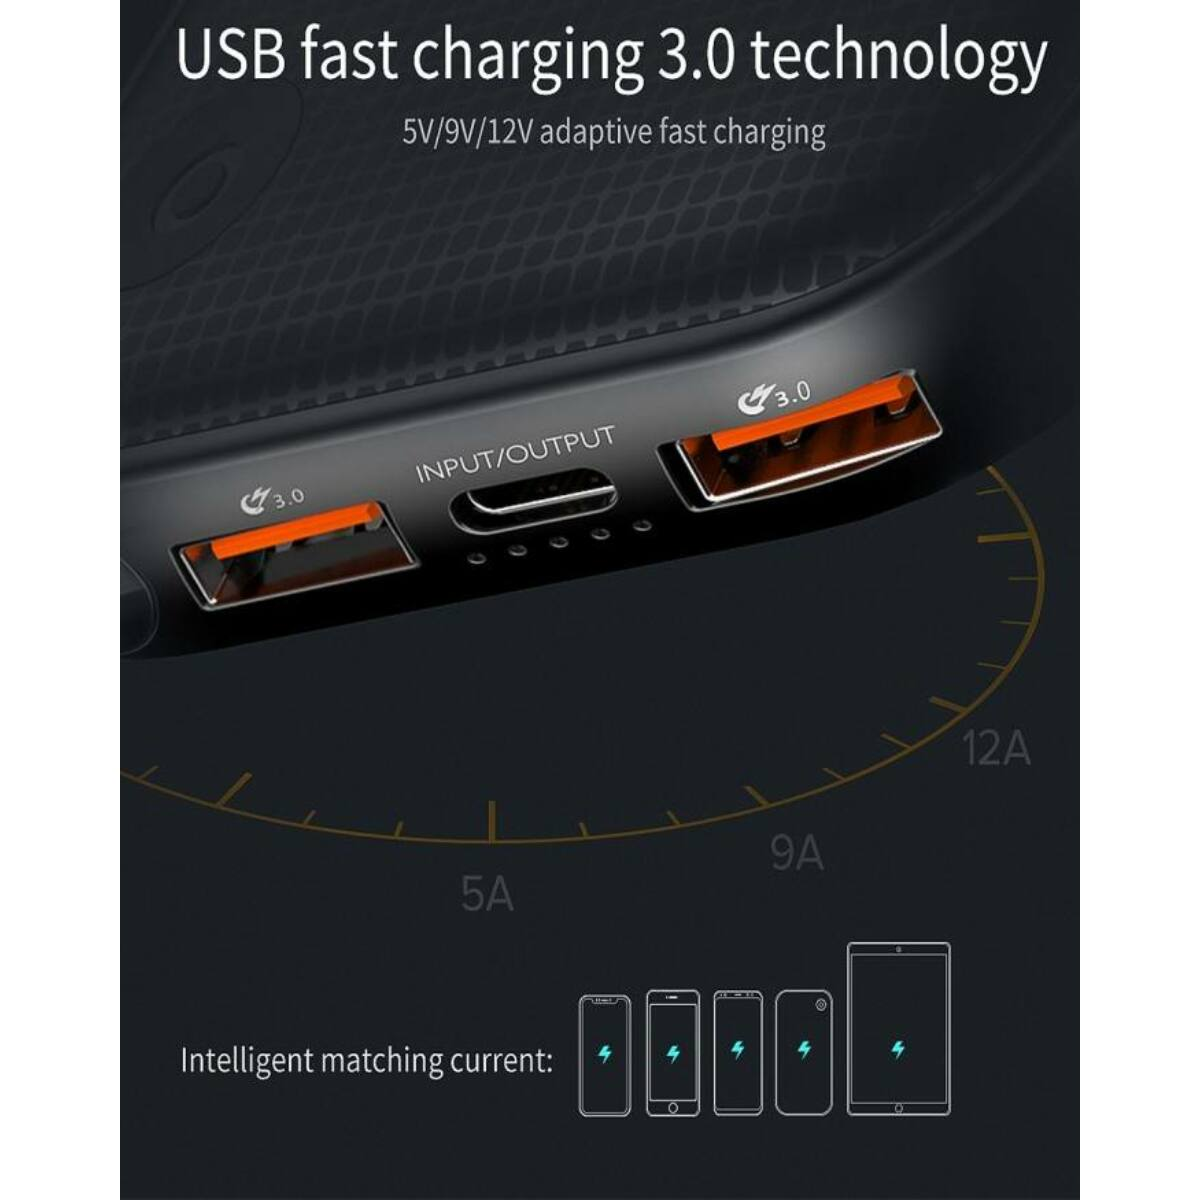 Baseus Power Bank Powerful (Micro USB + Type-C bemenet / dupla USB + Type-C PD kimenet), 2.4A, 20.000 mAh, fekete (PPKC-A01)